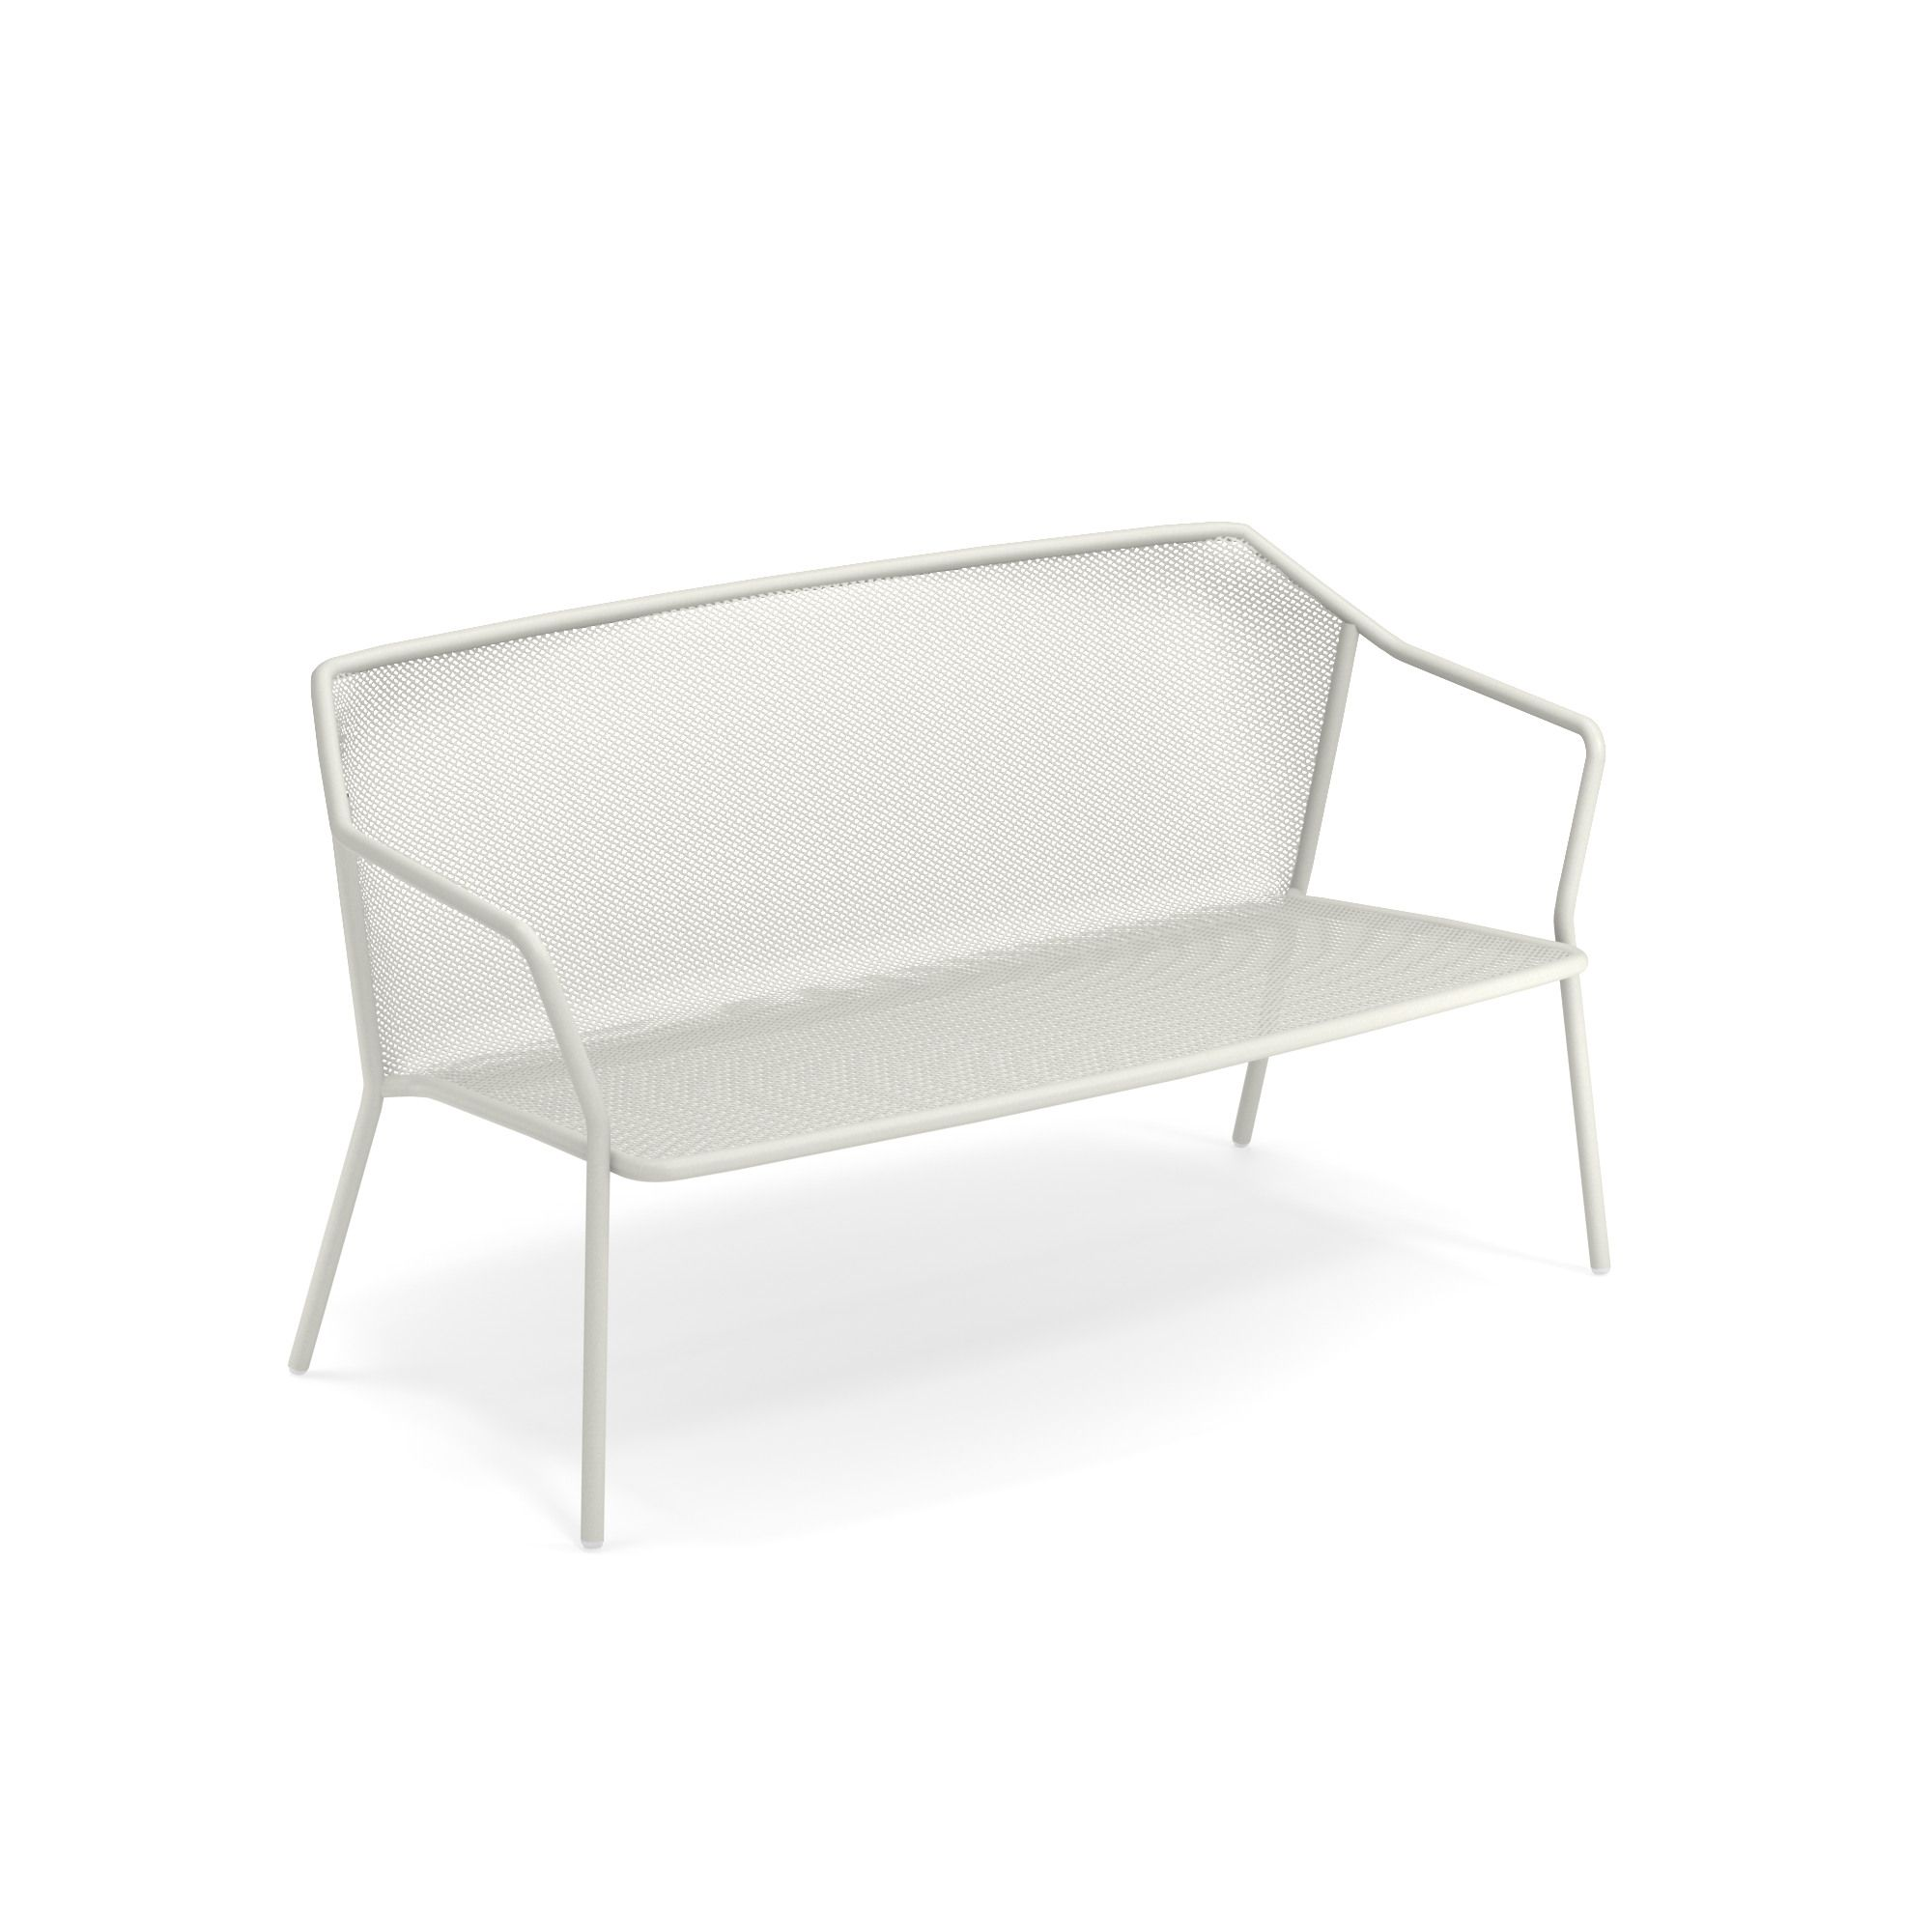 emuamericas, llc 527-23 sofa seating, outdoor